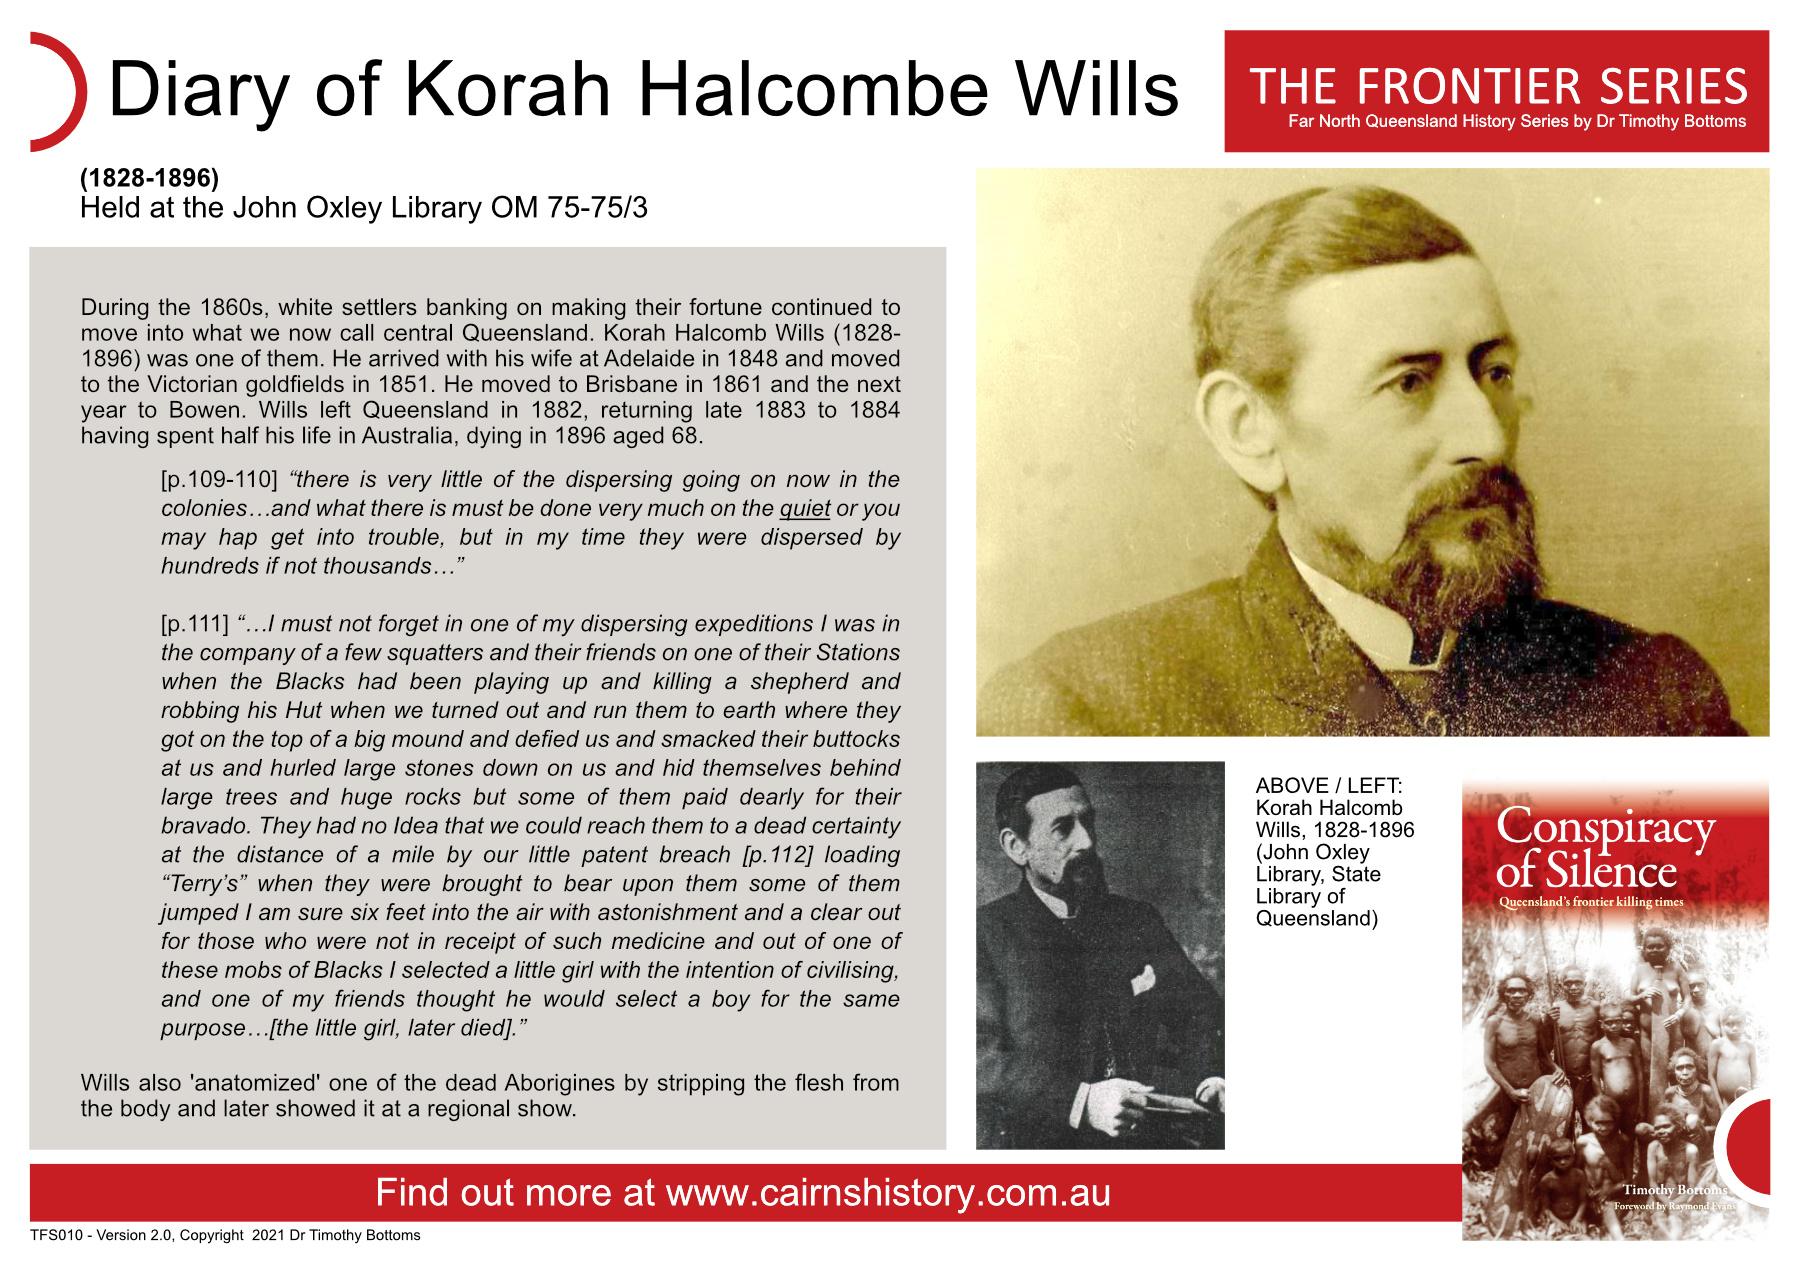 The Frontier Series Diary of Korah Halcombe Wills